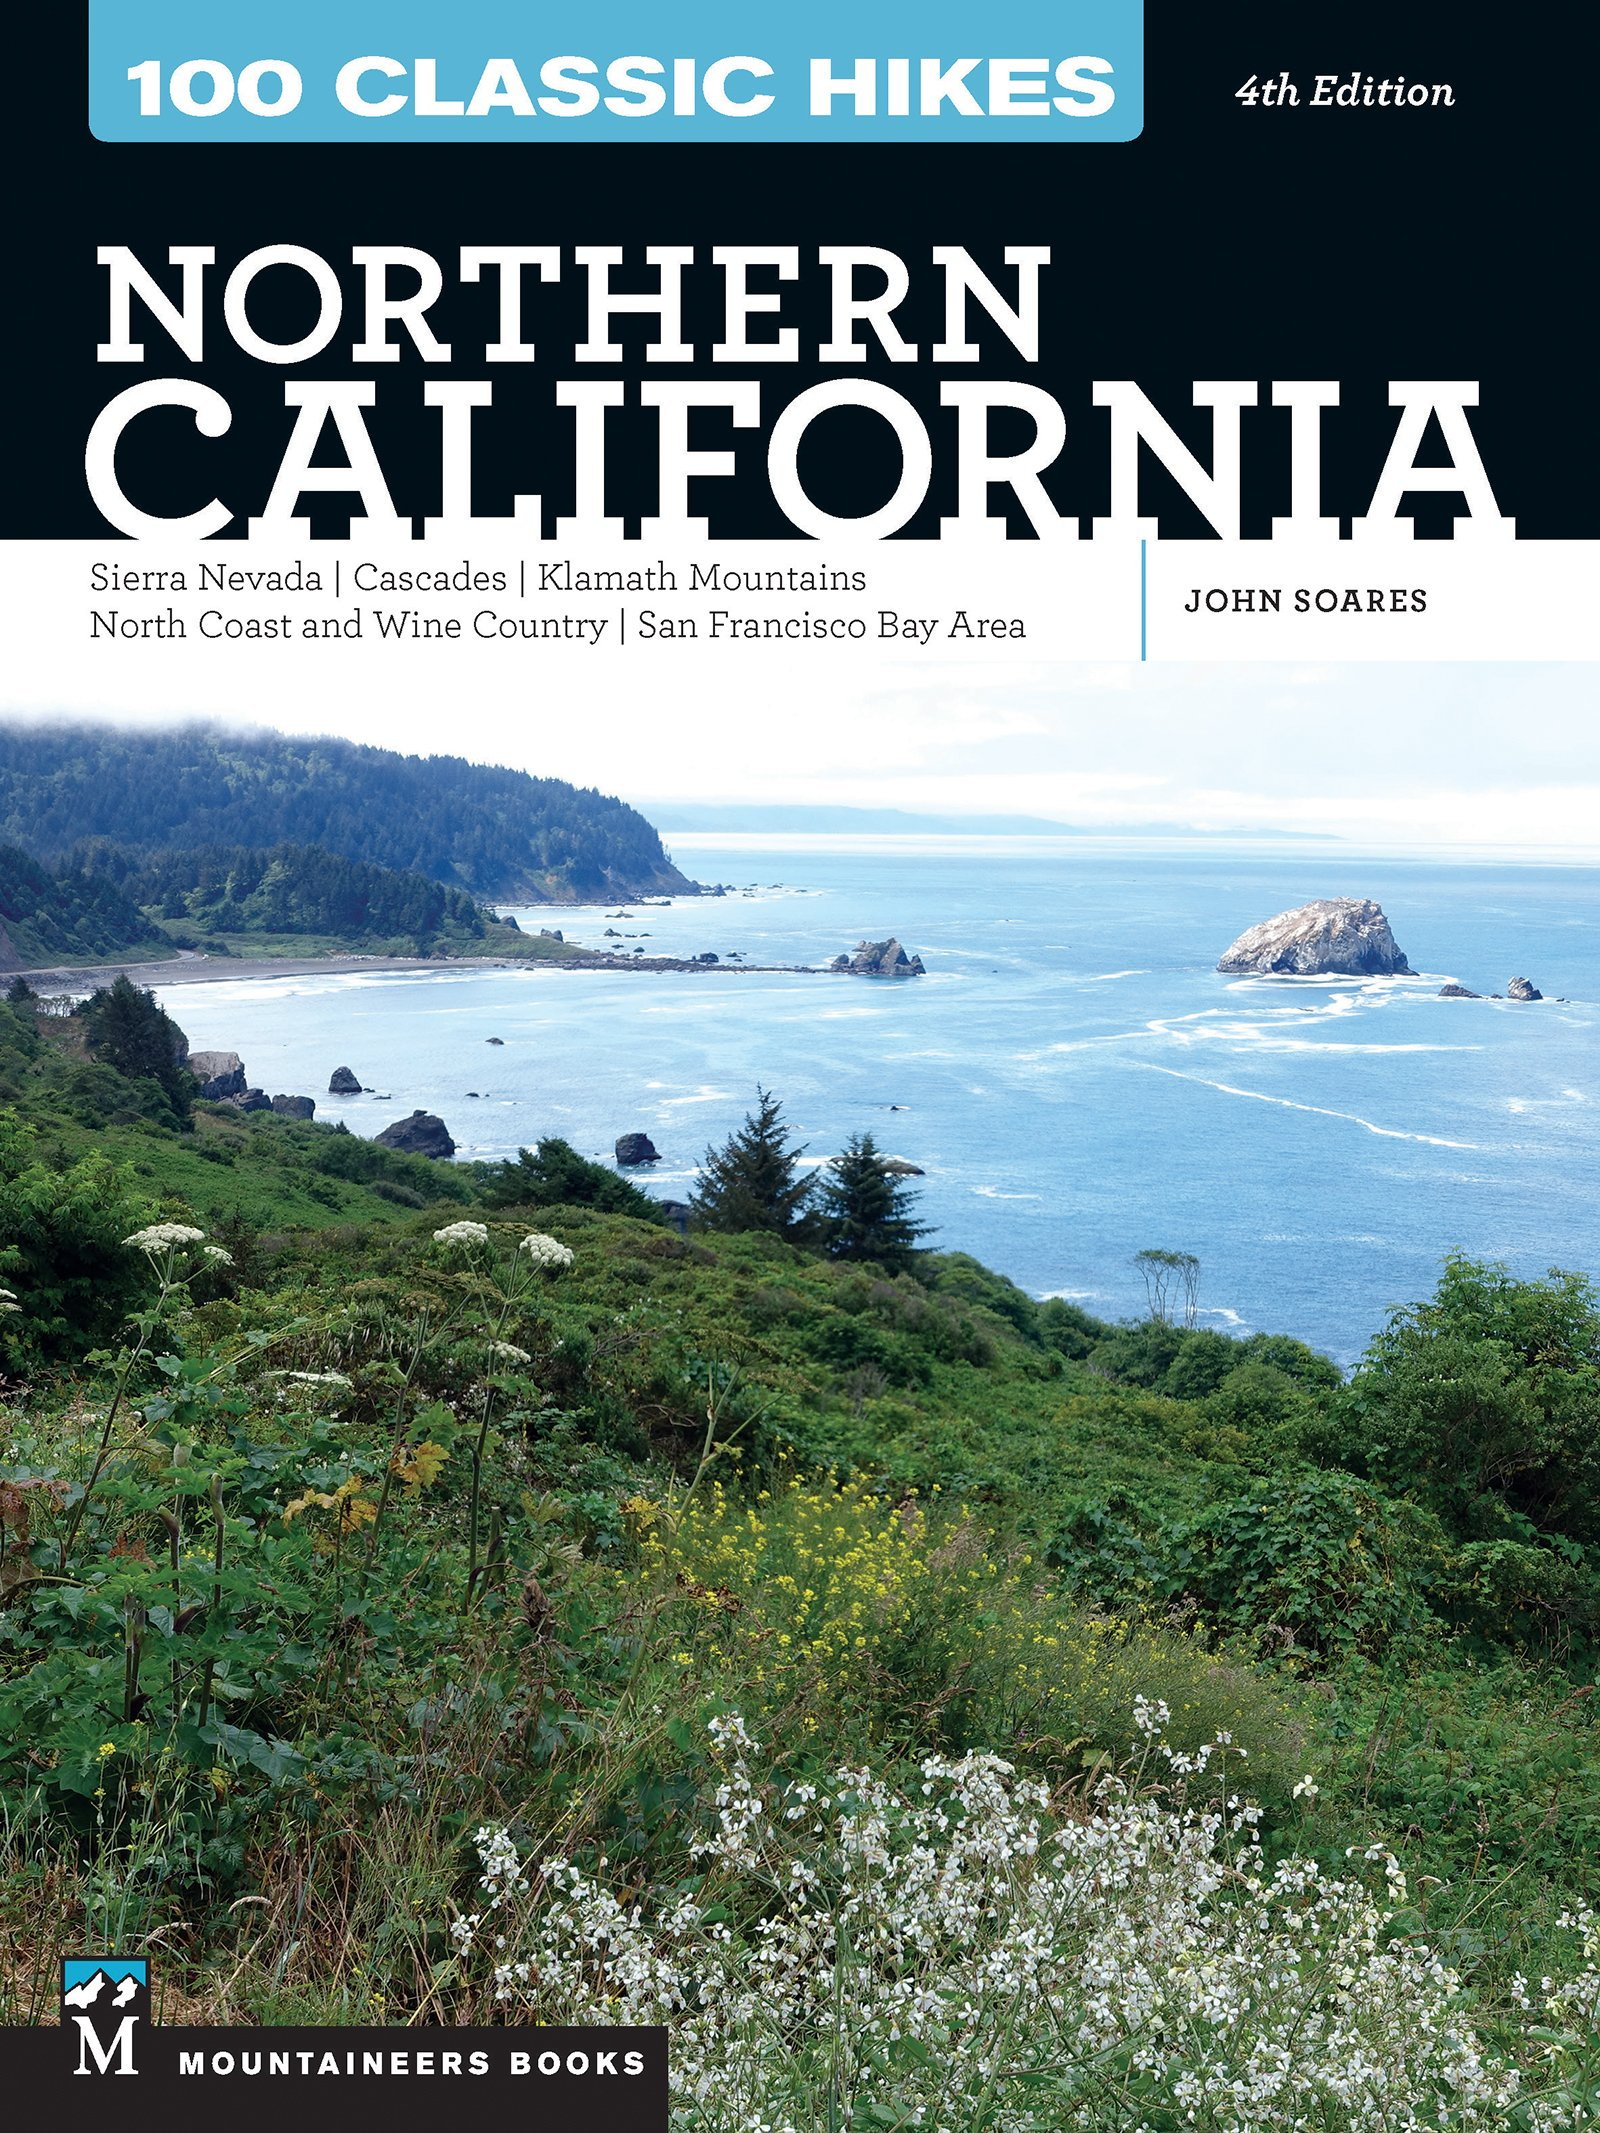 100 Classic Hikes California Mountains